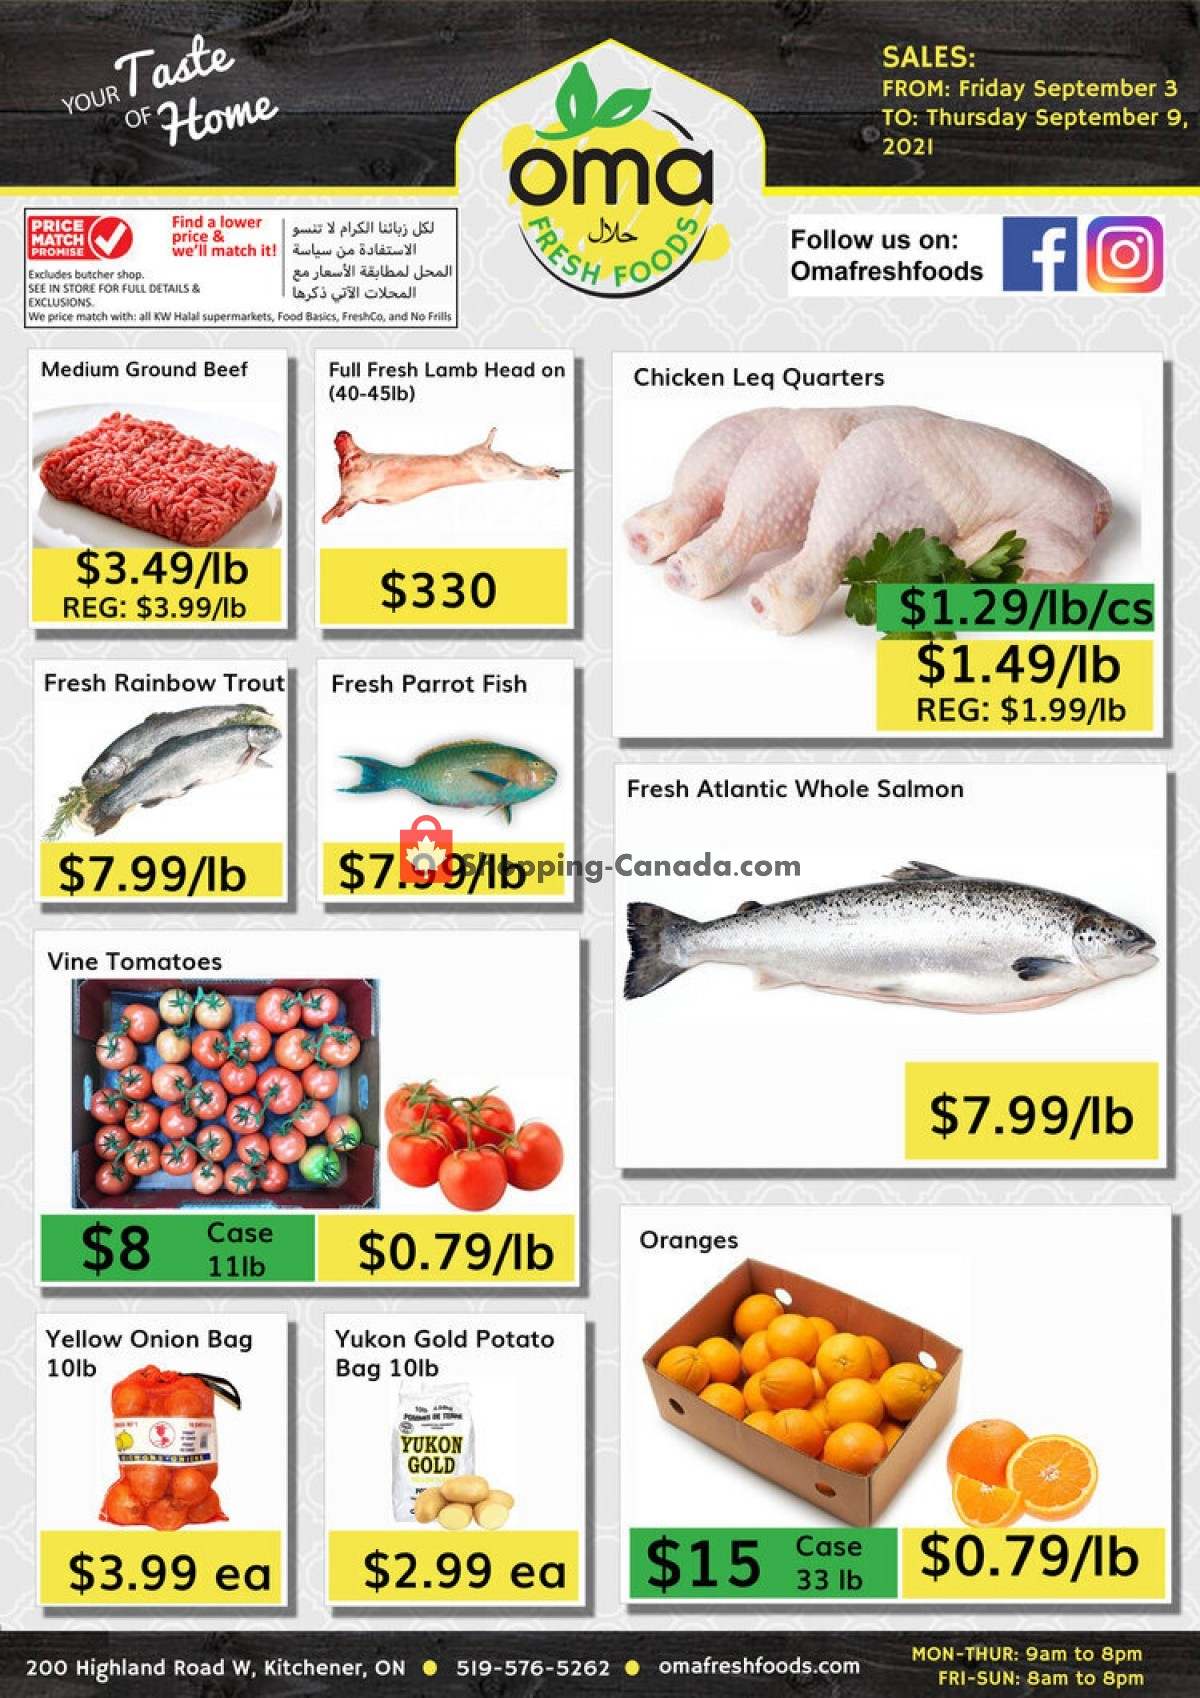 Flyer Oma fresh foods Canada - from Friday September 3, 2021 to Thursday September 9, 2021